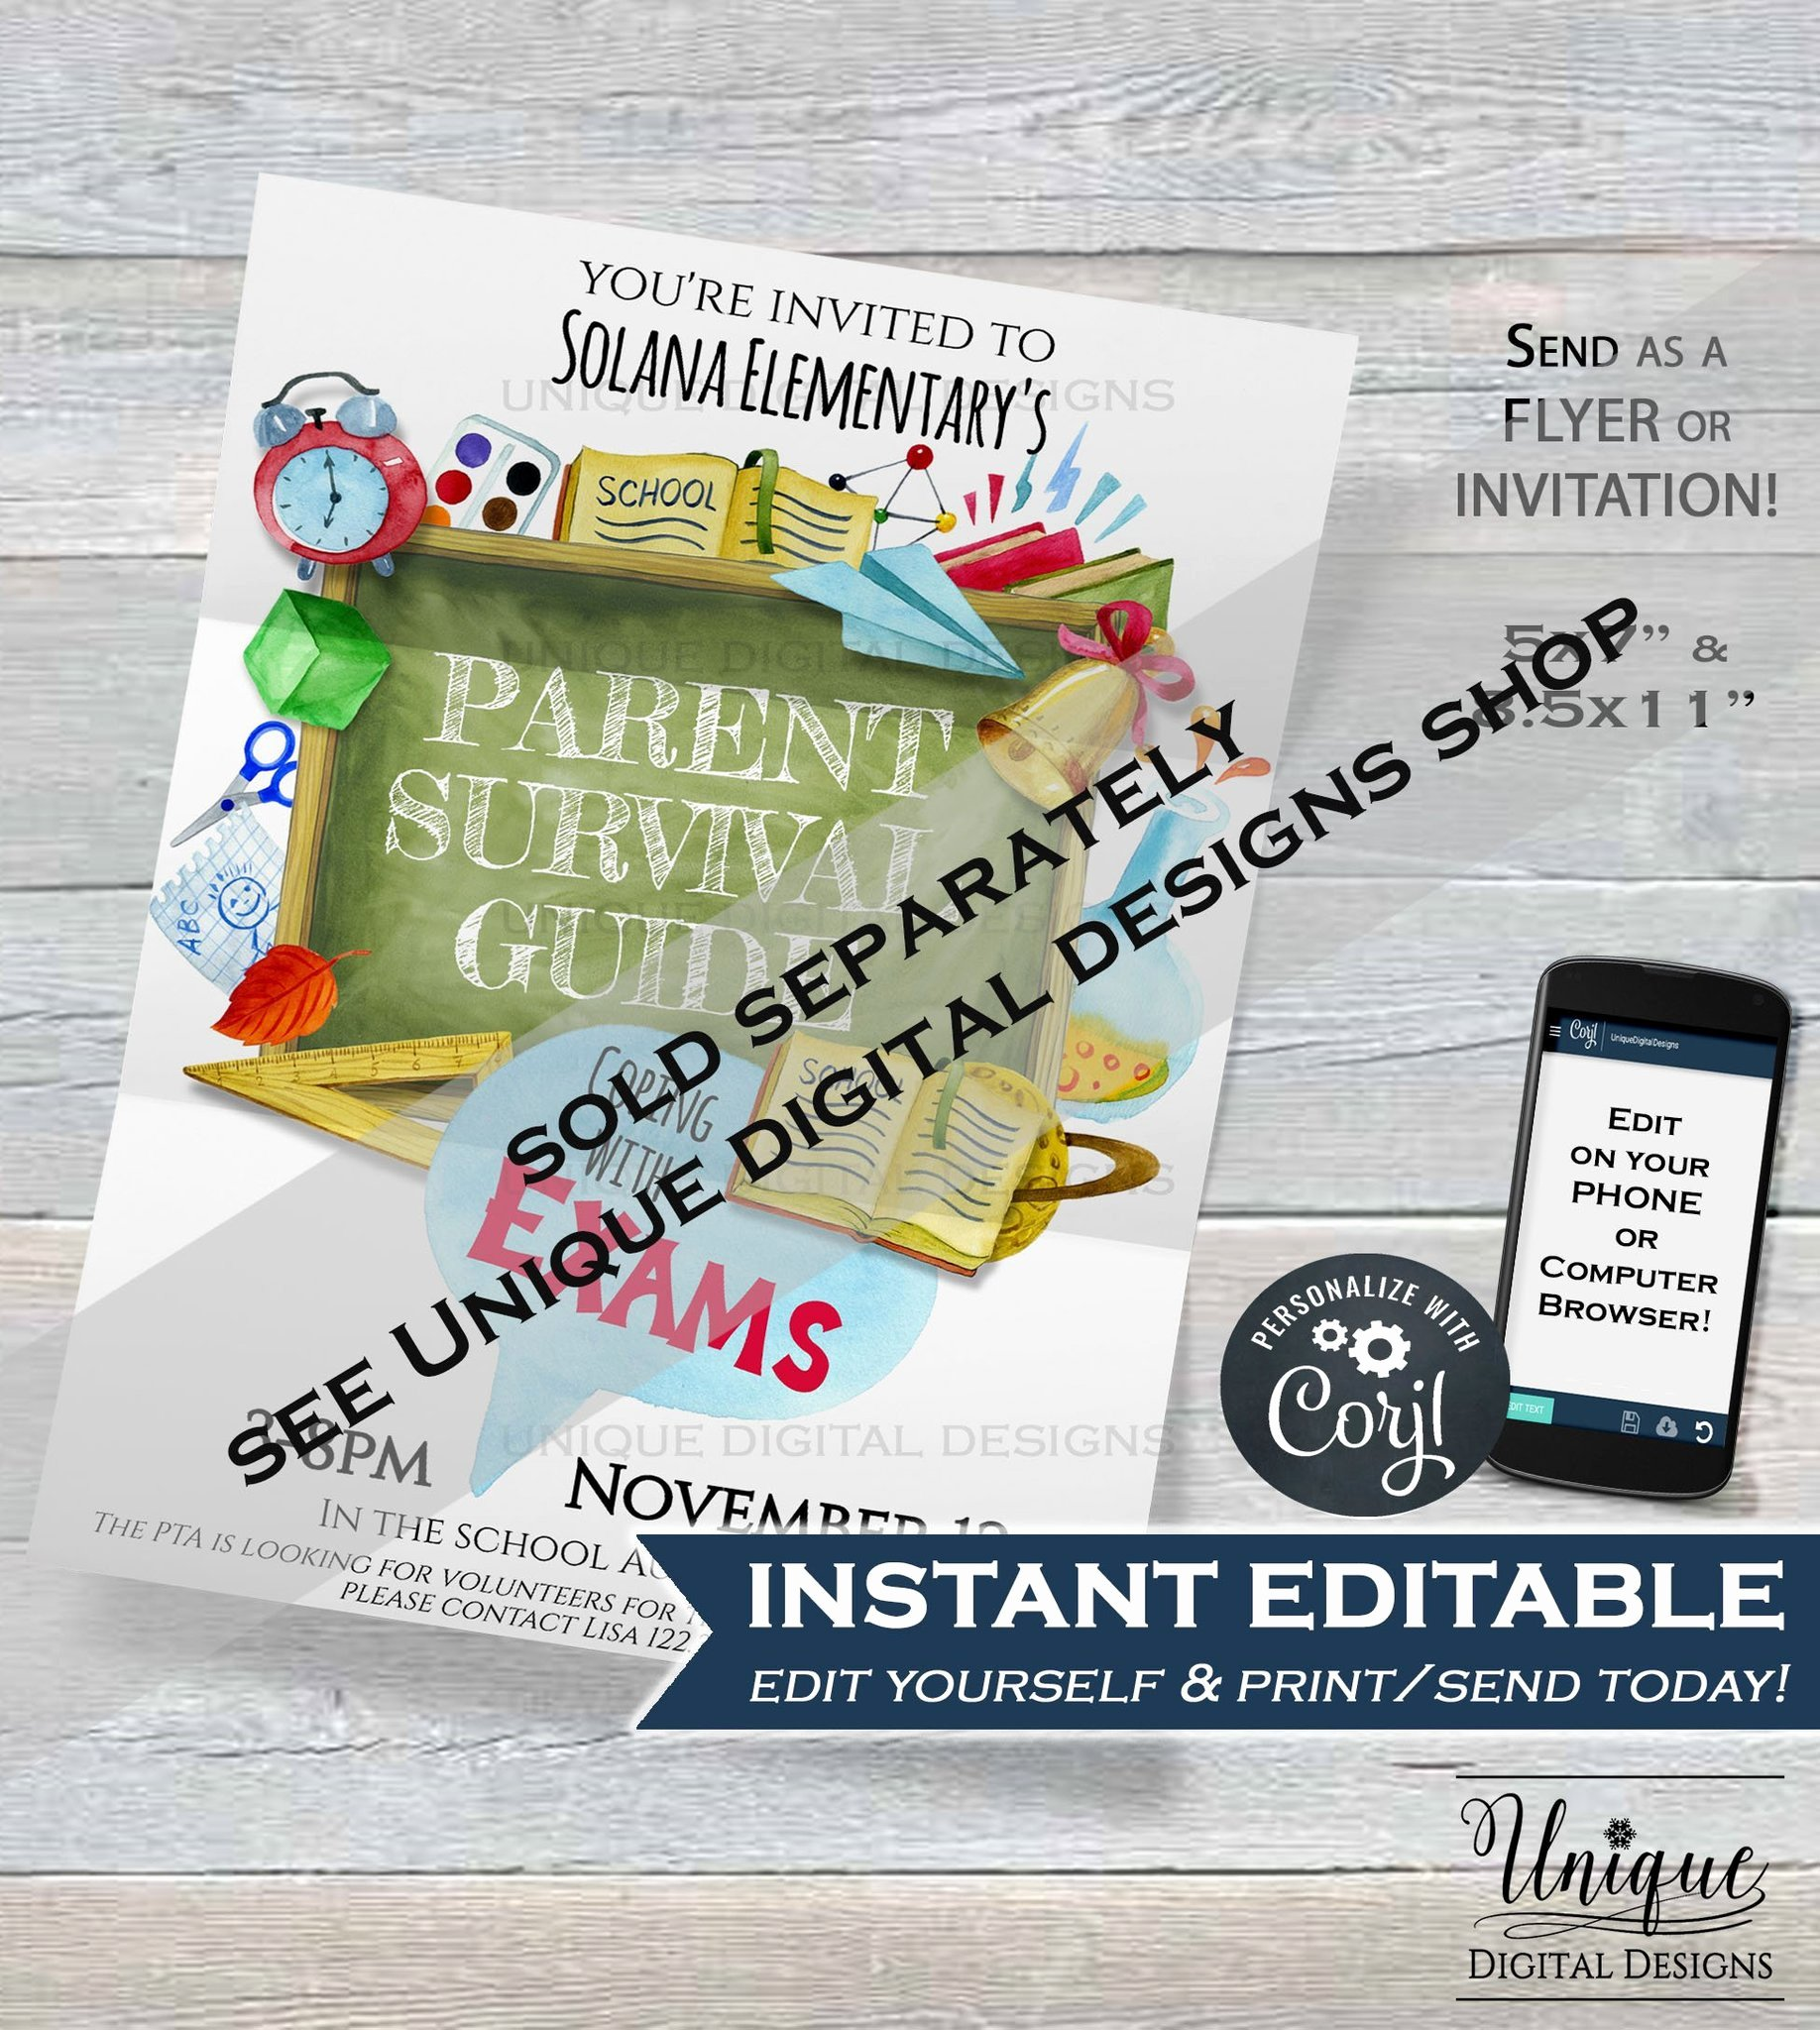 Employee Appreciation Day Flyer Template Awesome Teacher Appreciation Week Invitation Editable School